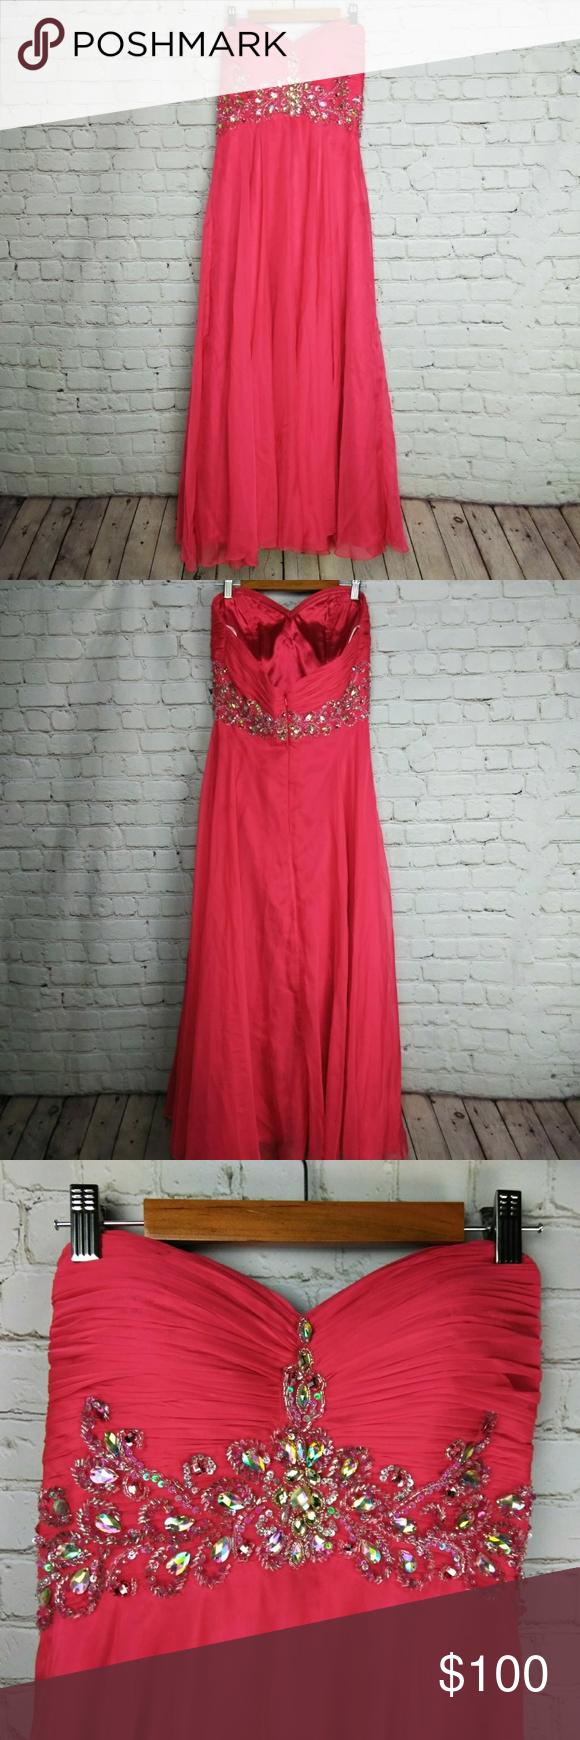 Cinderella rhinestone prom dress used gorgeous watermelon chiffon